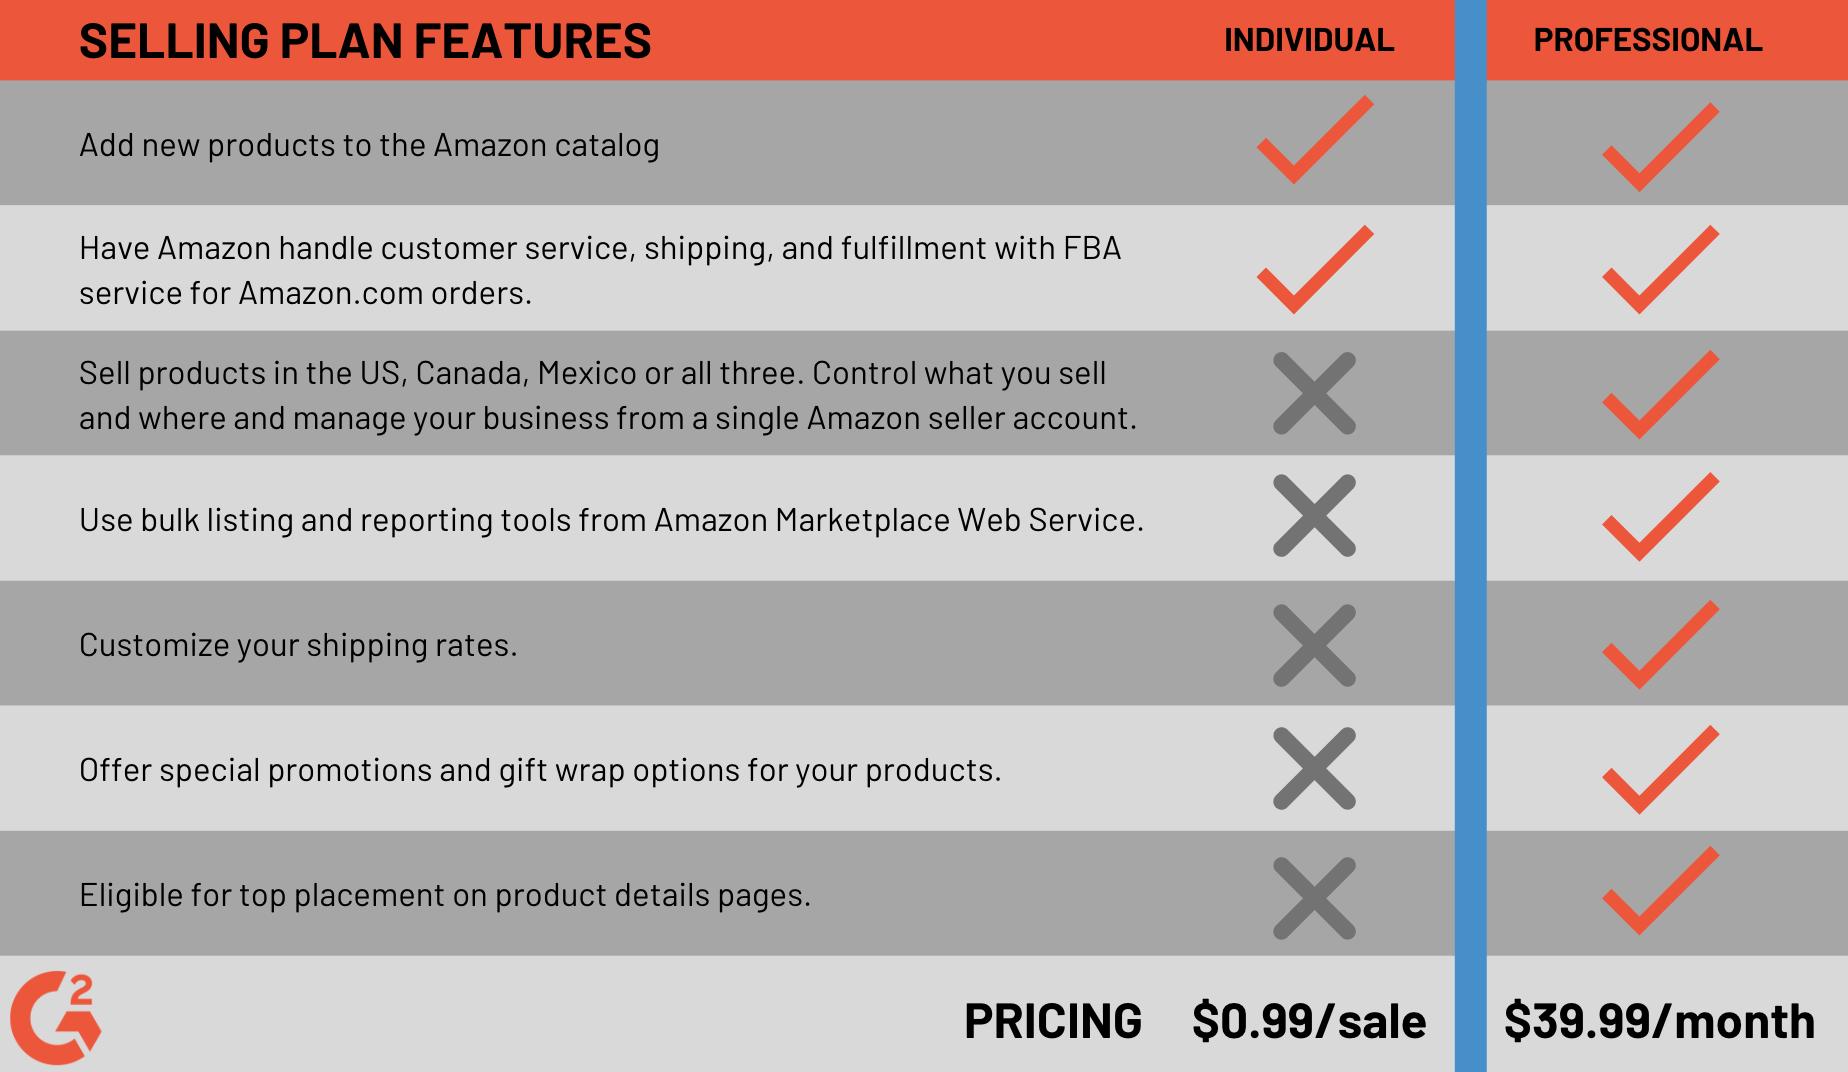 Amazon subscription fees